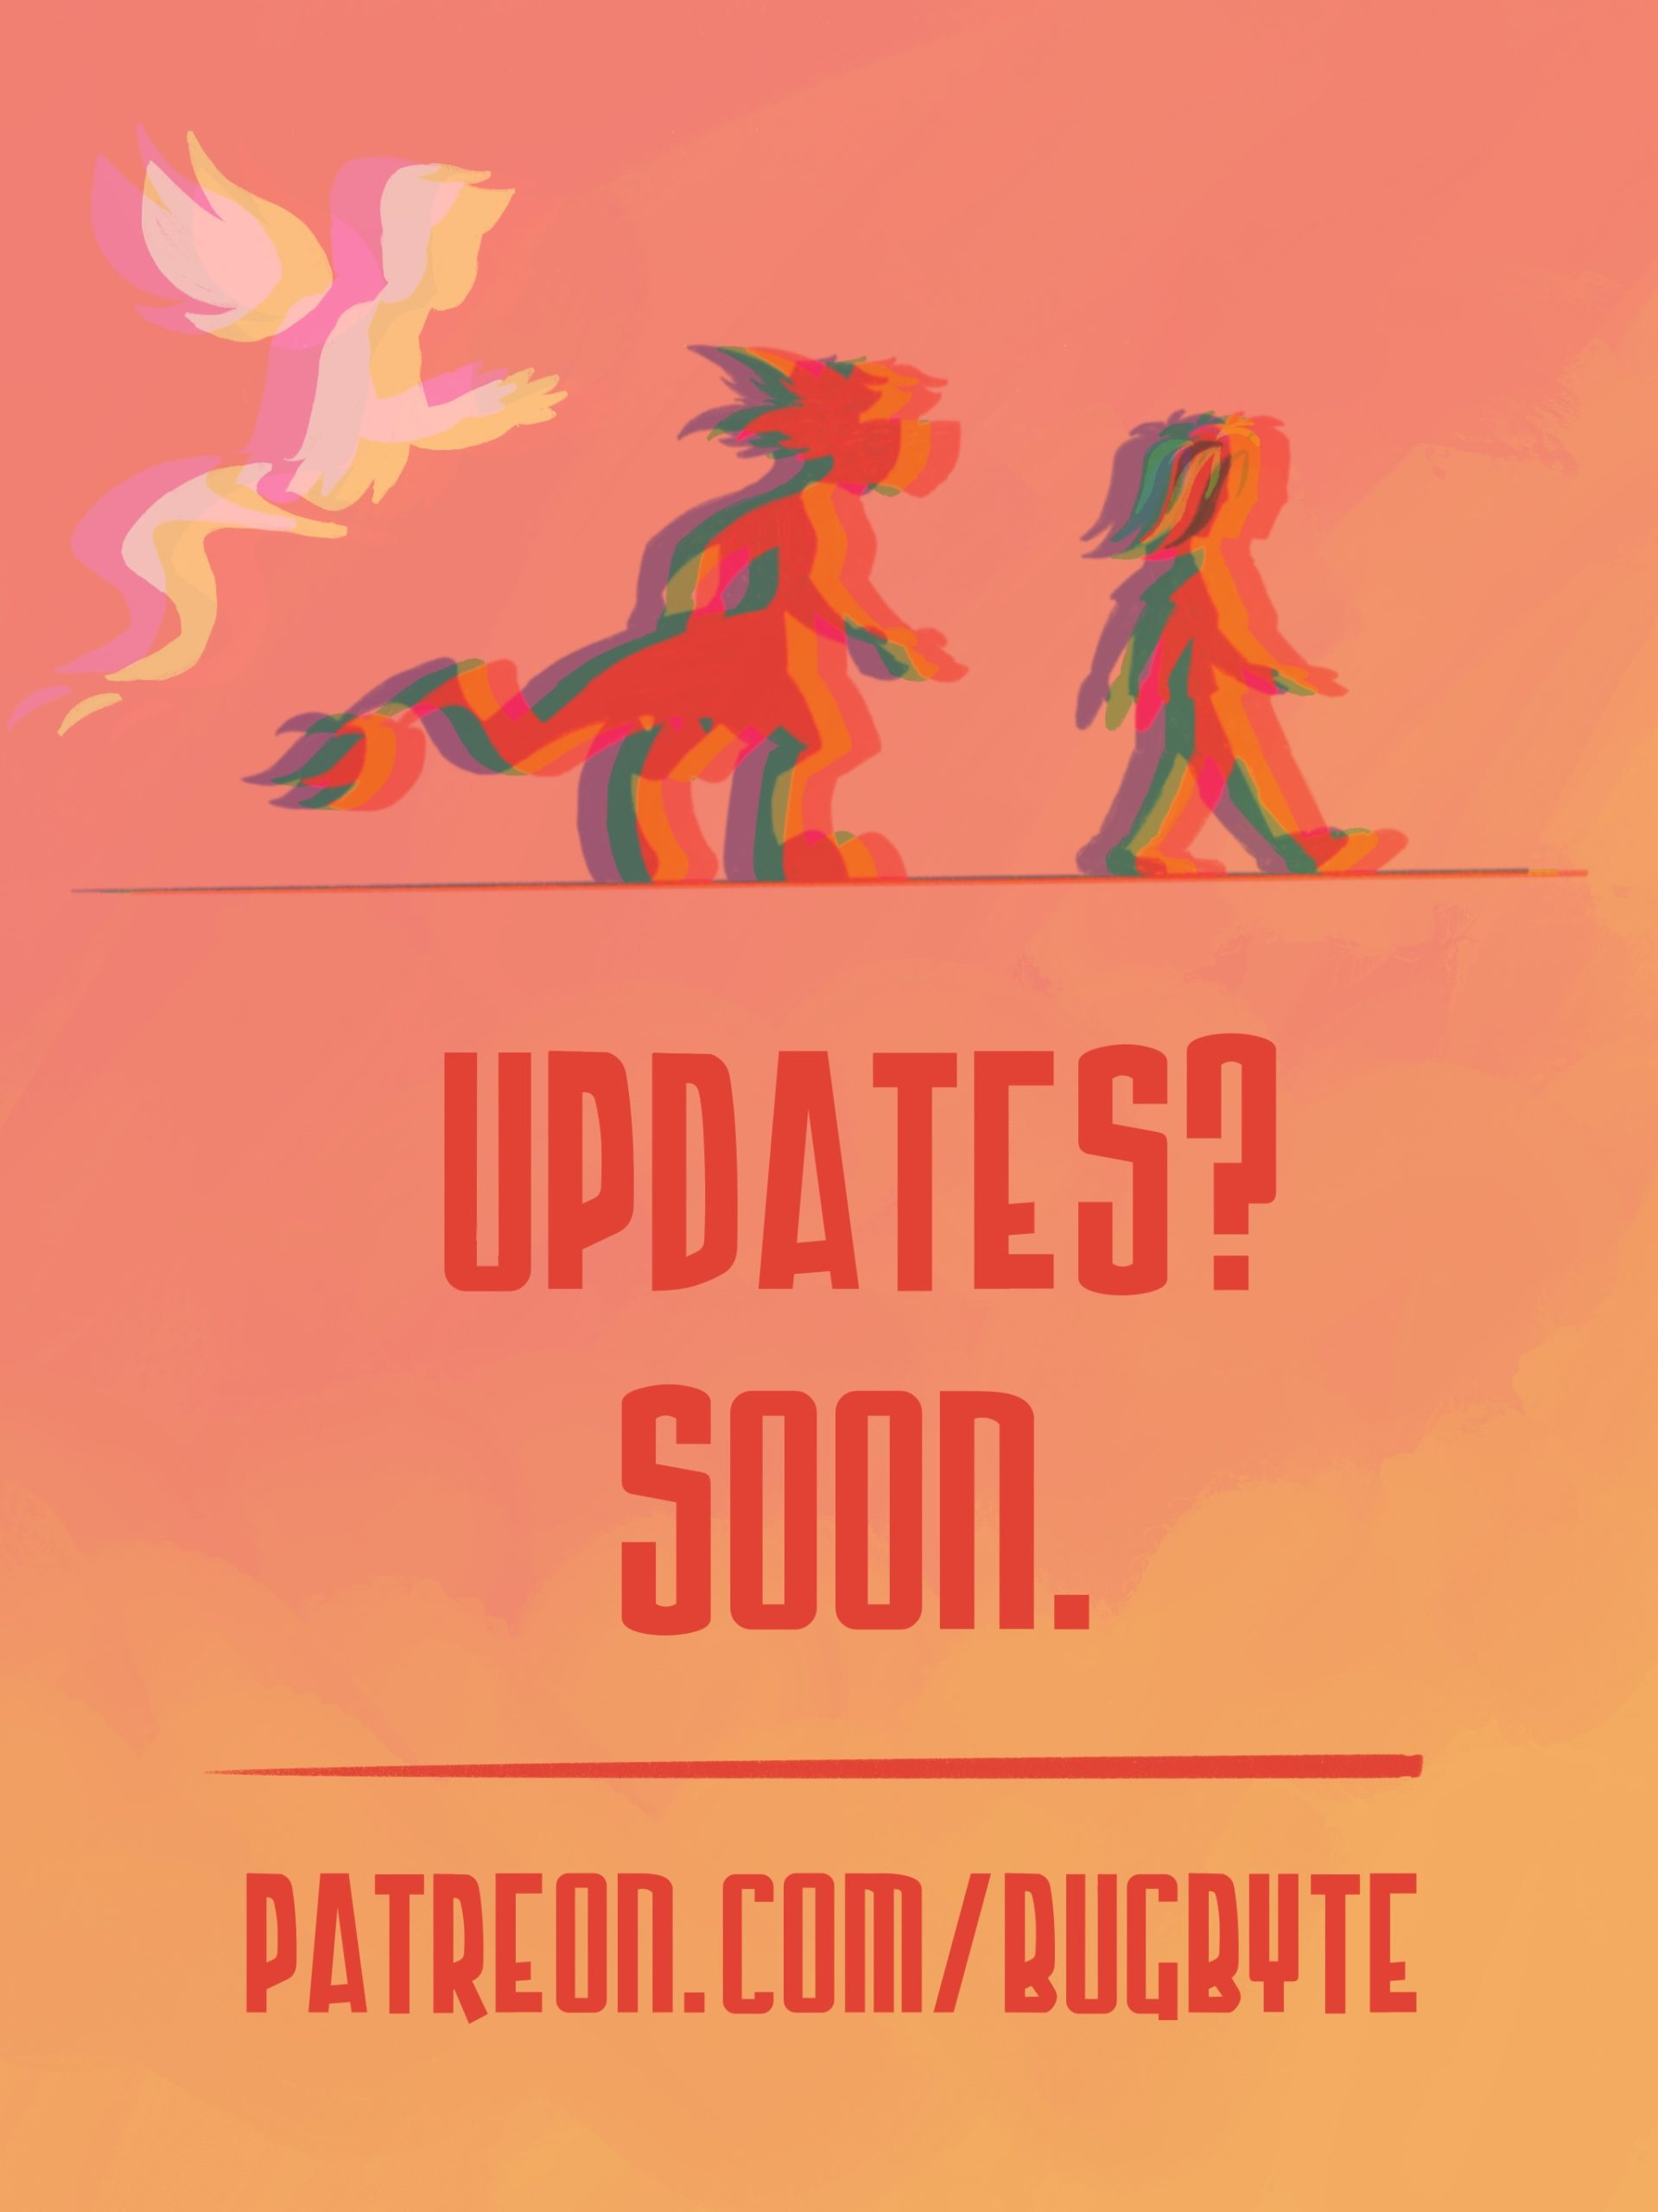 Updates? Soon. Patreon.com/bugbyte